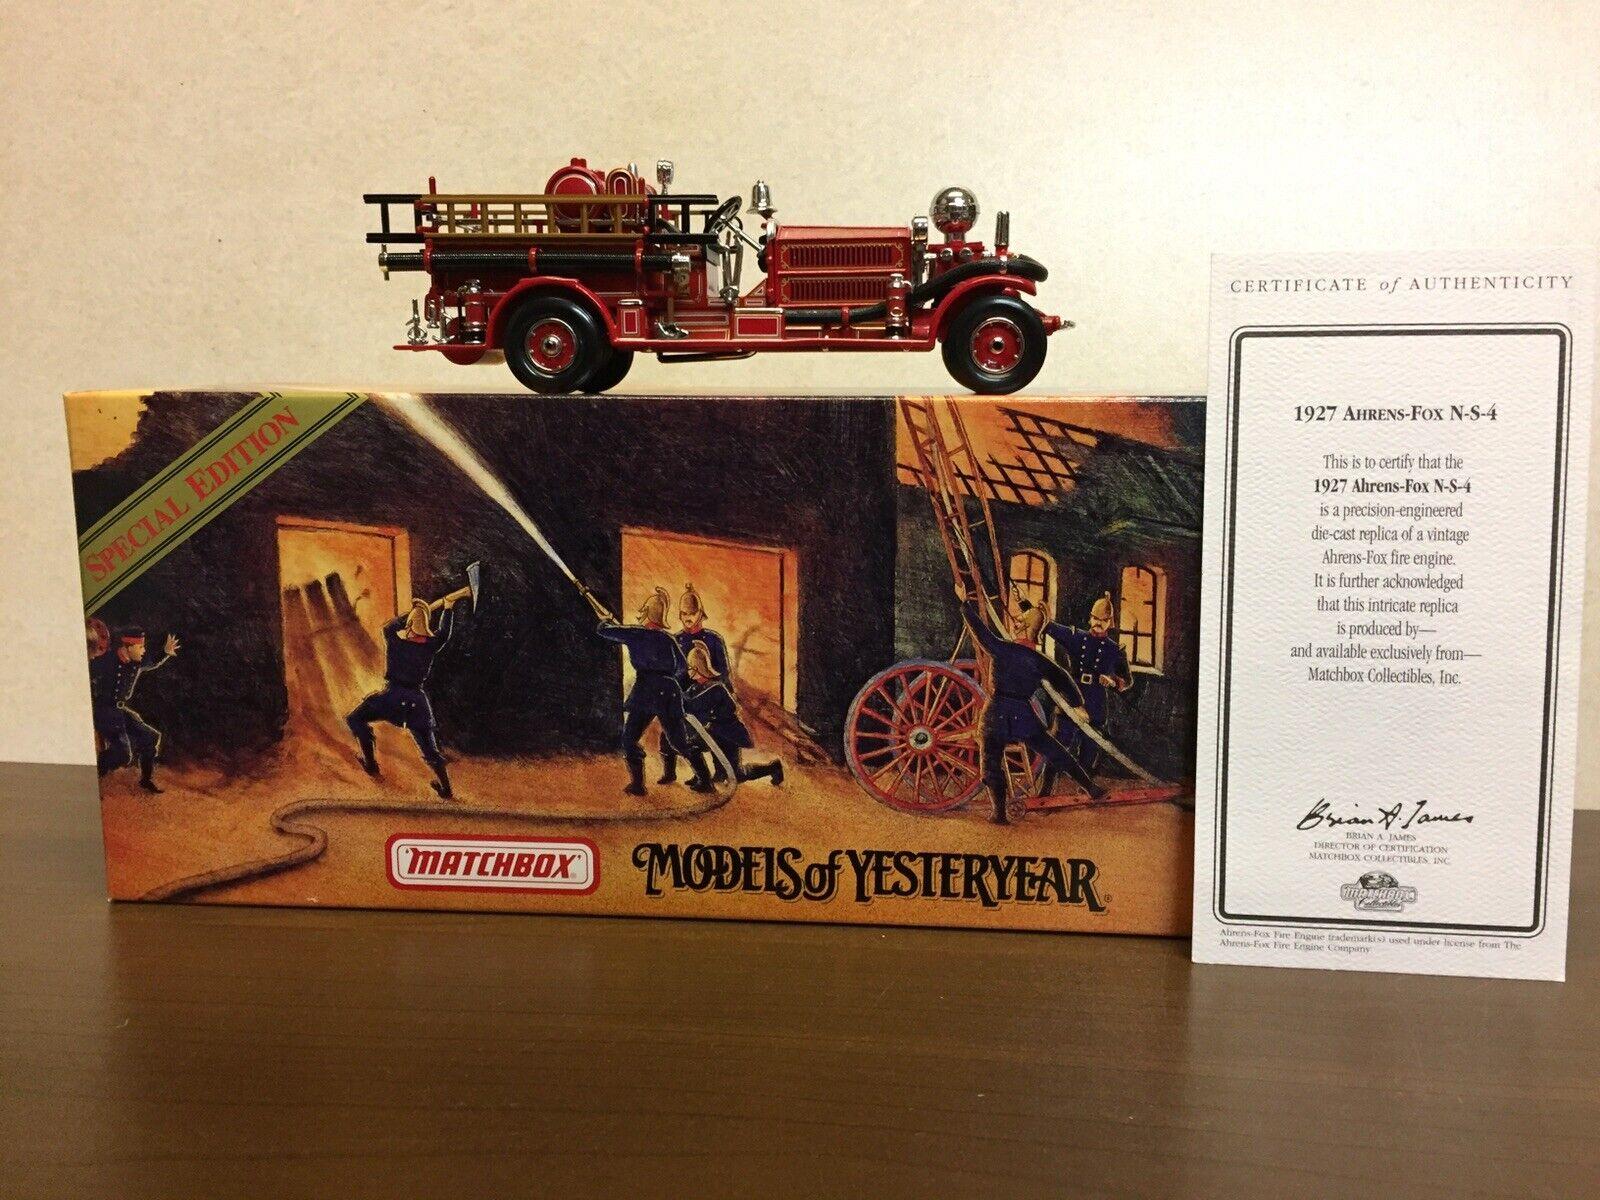 MatchBox Modellls of yesteryear YSFE 04 Ahrens &Fox N-S-4 ,Fire Engine